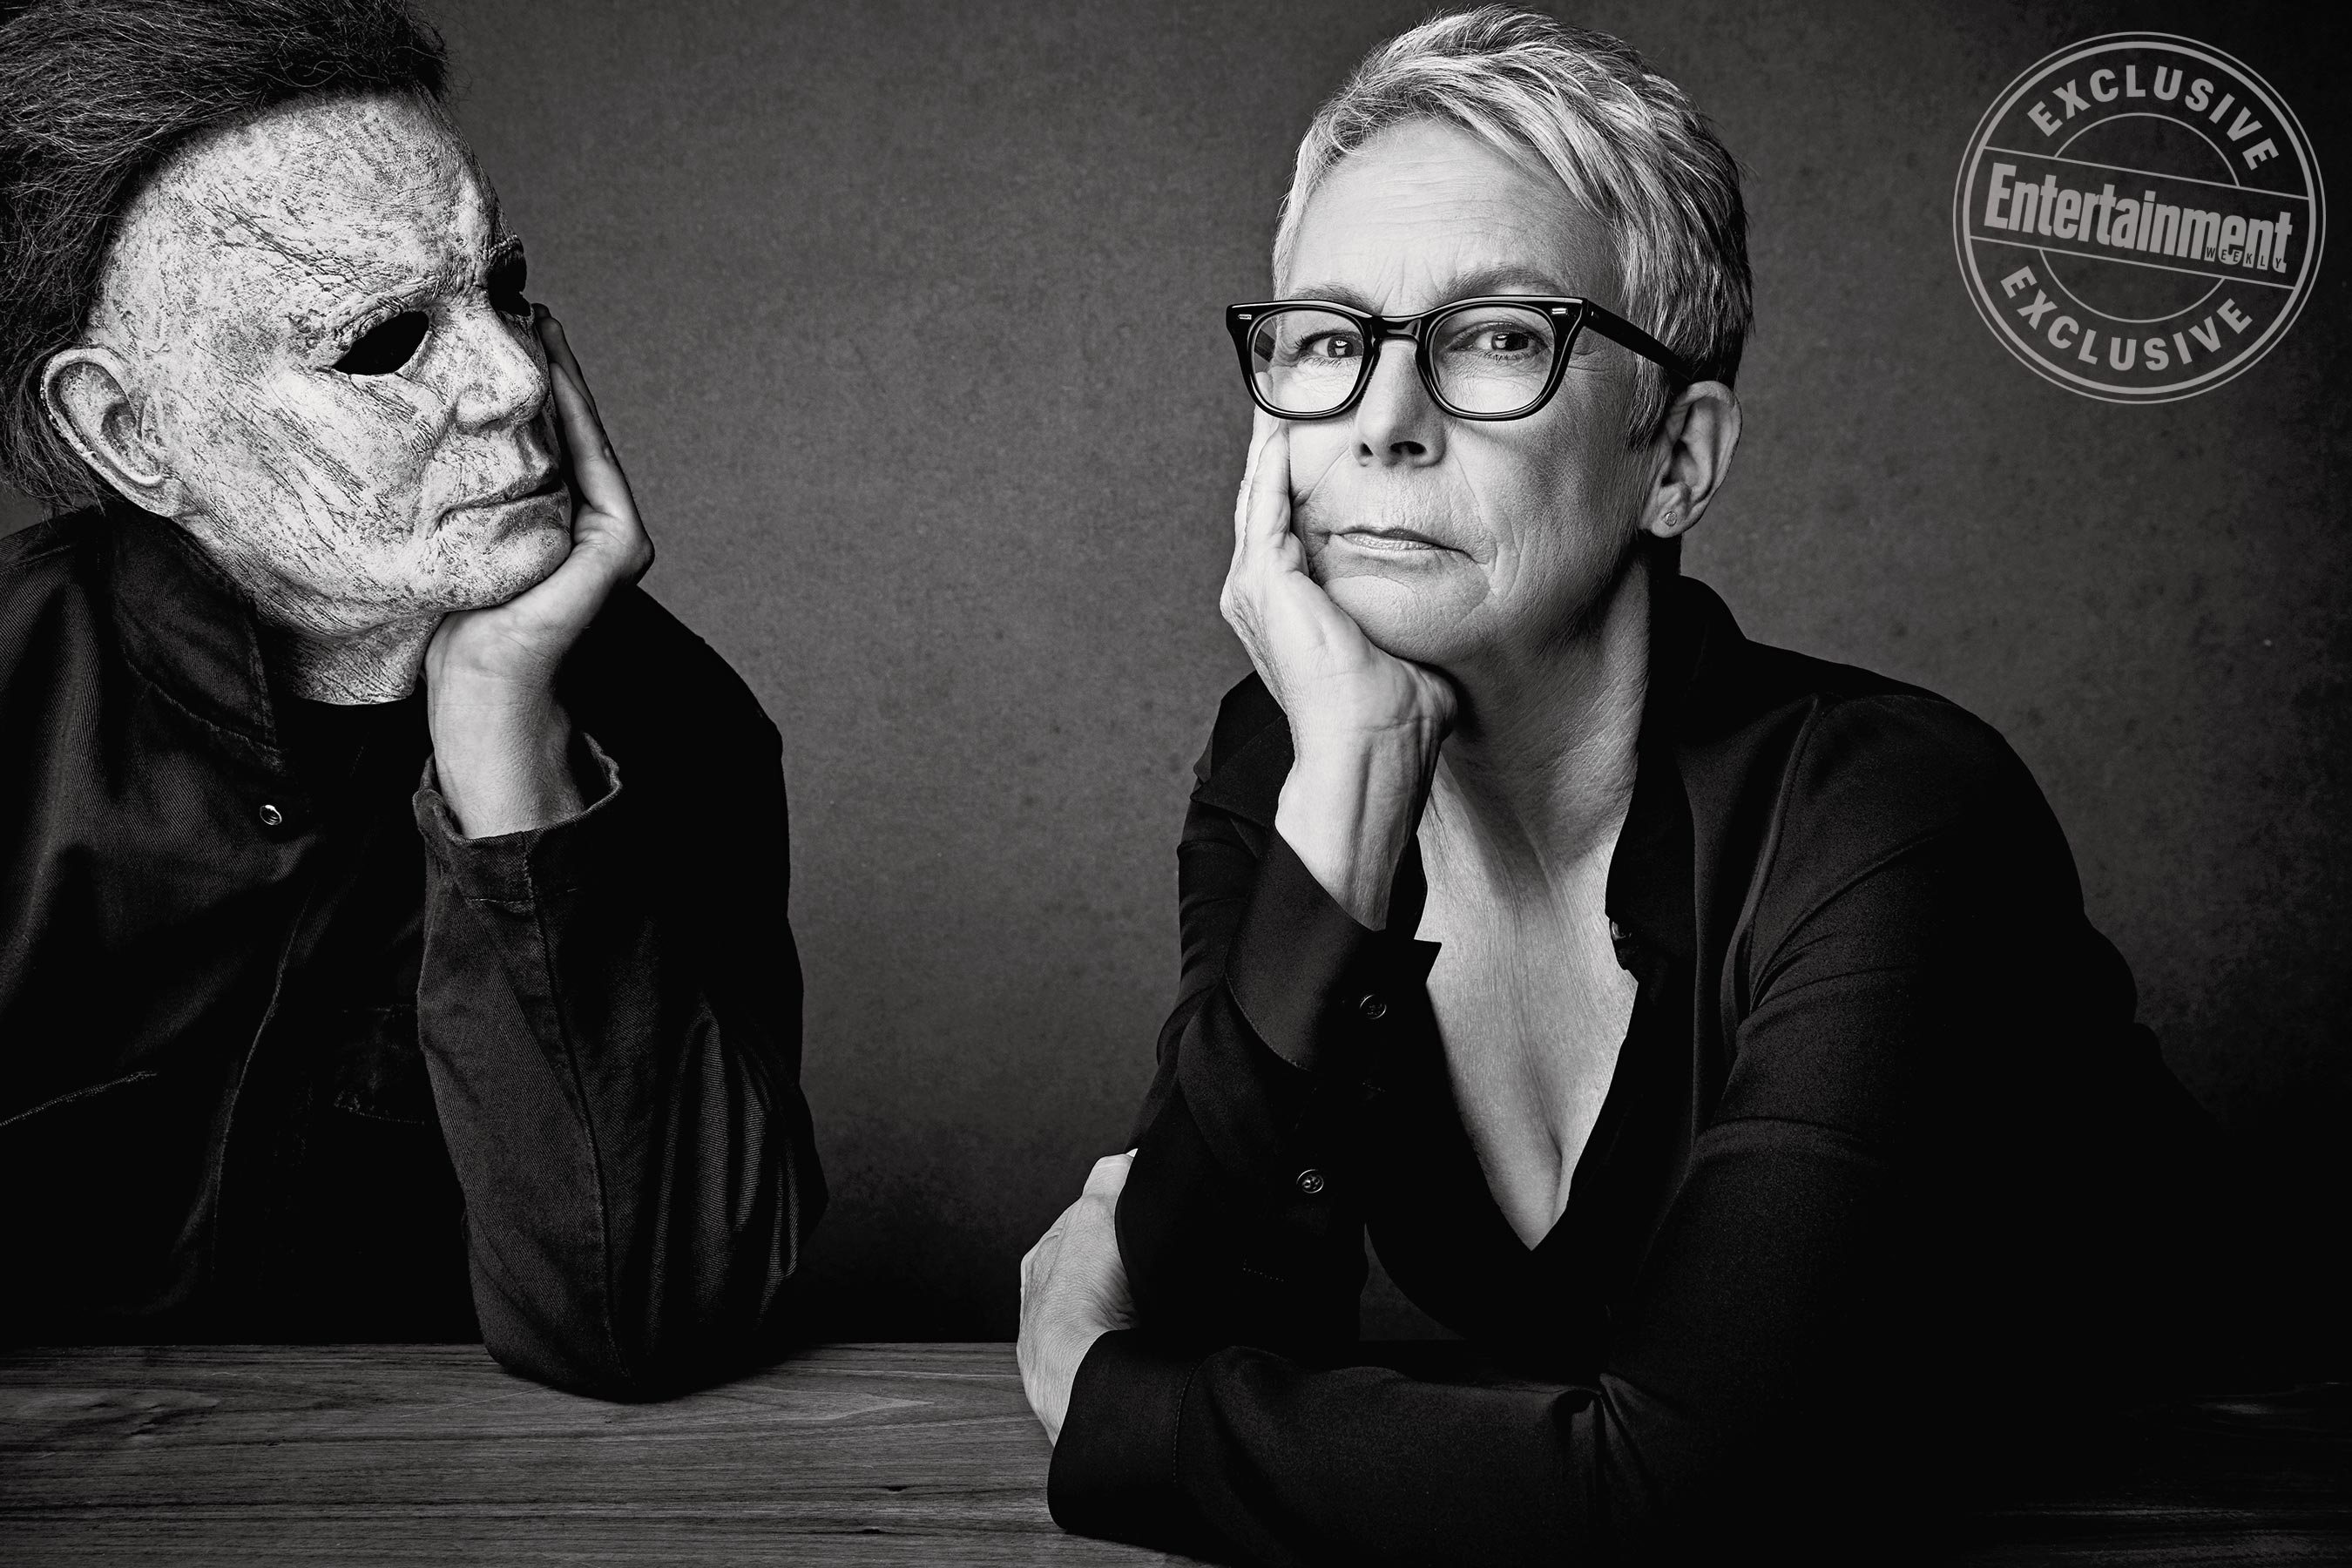 хэллоуин 2018 Entertainment Weekly фильмы ужасов фото